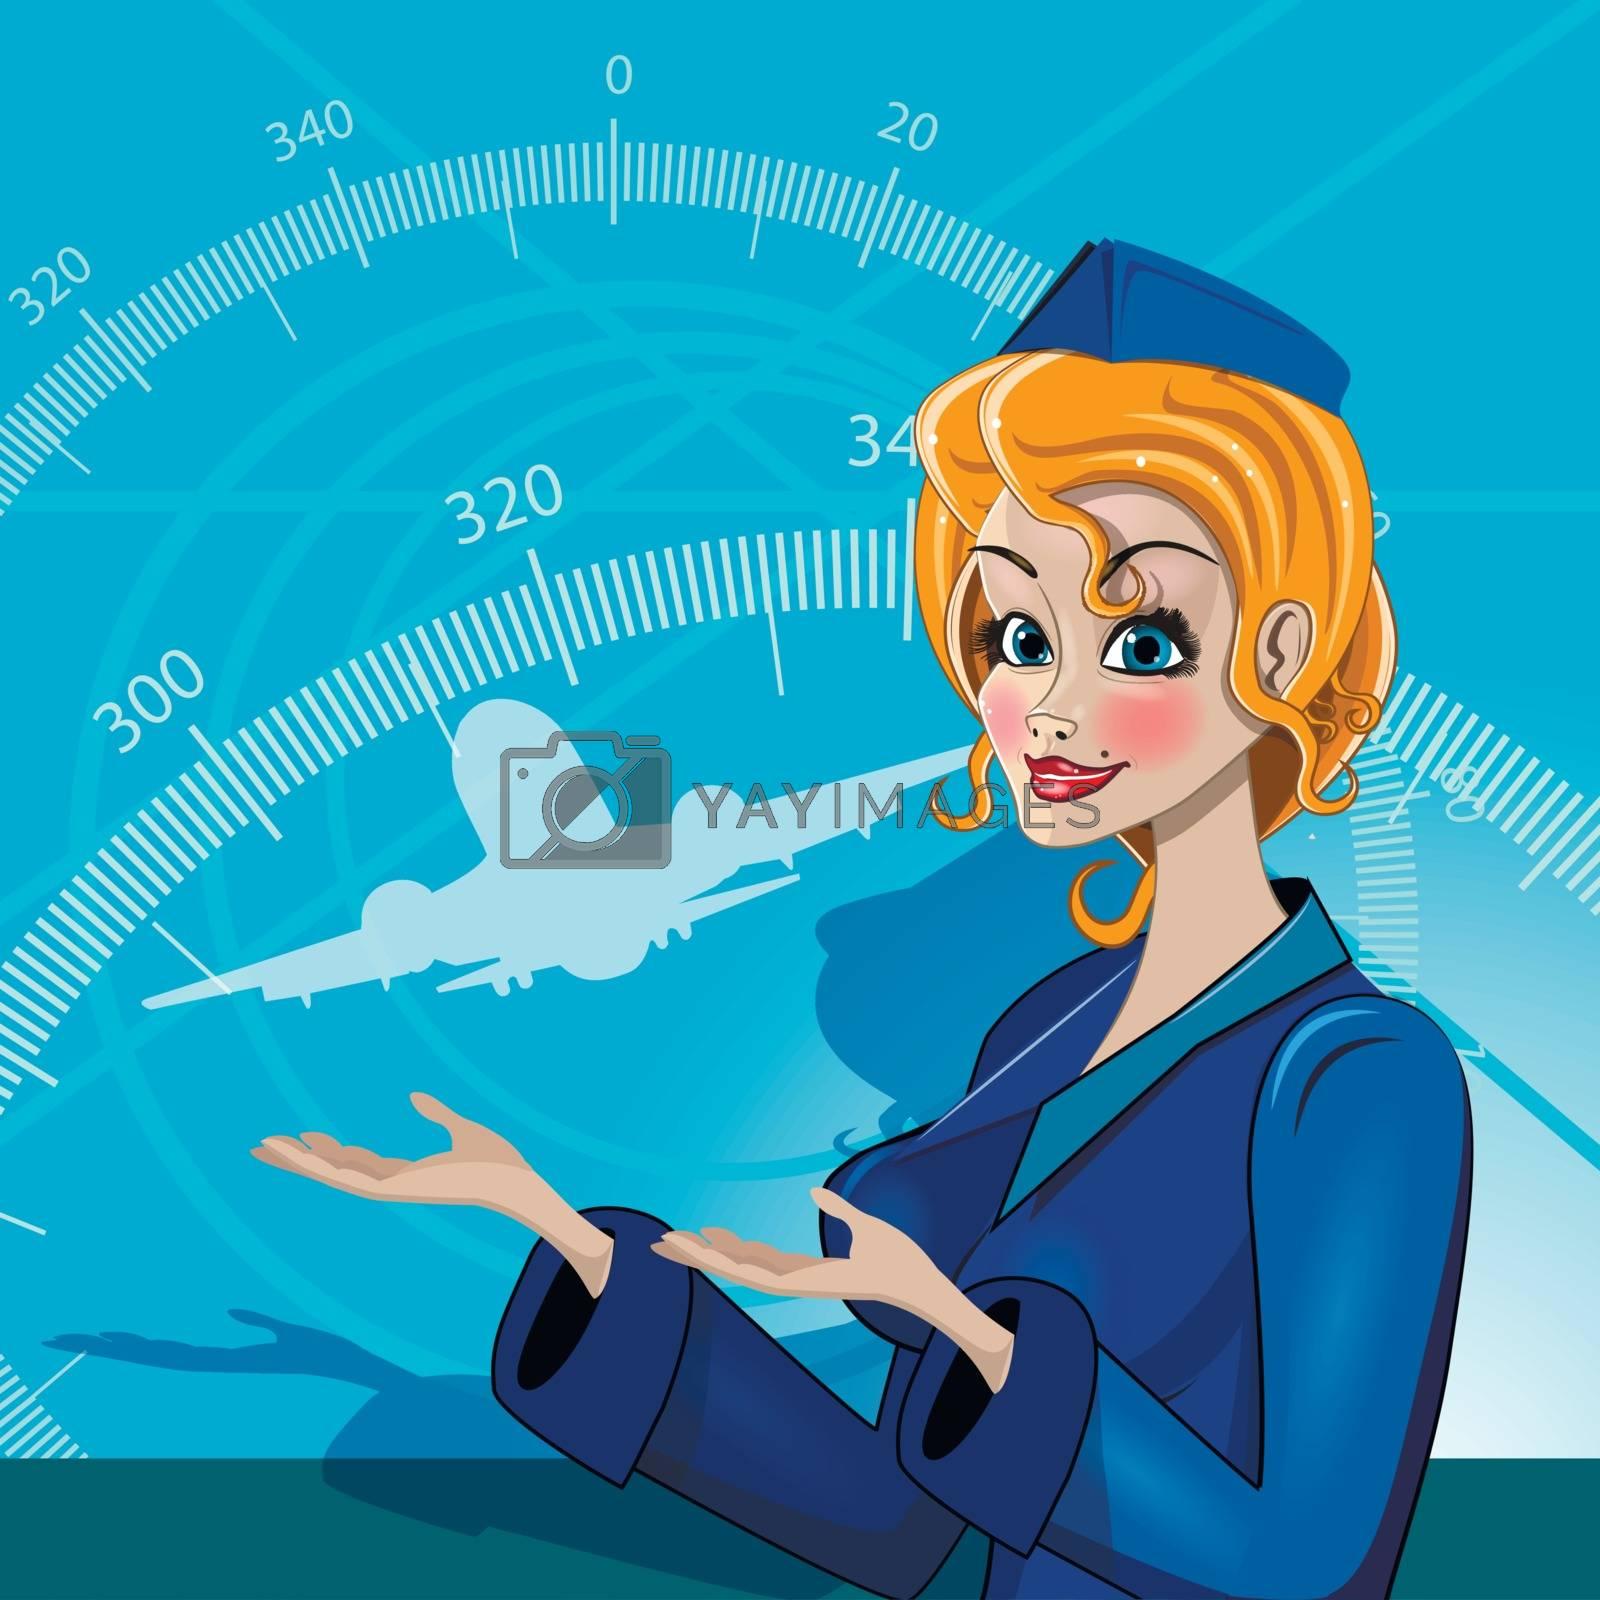 Illustration stewardess in uniform on blue background